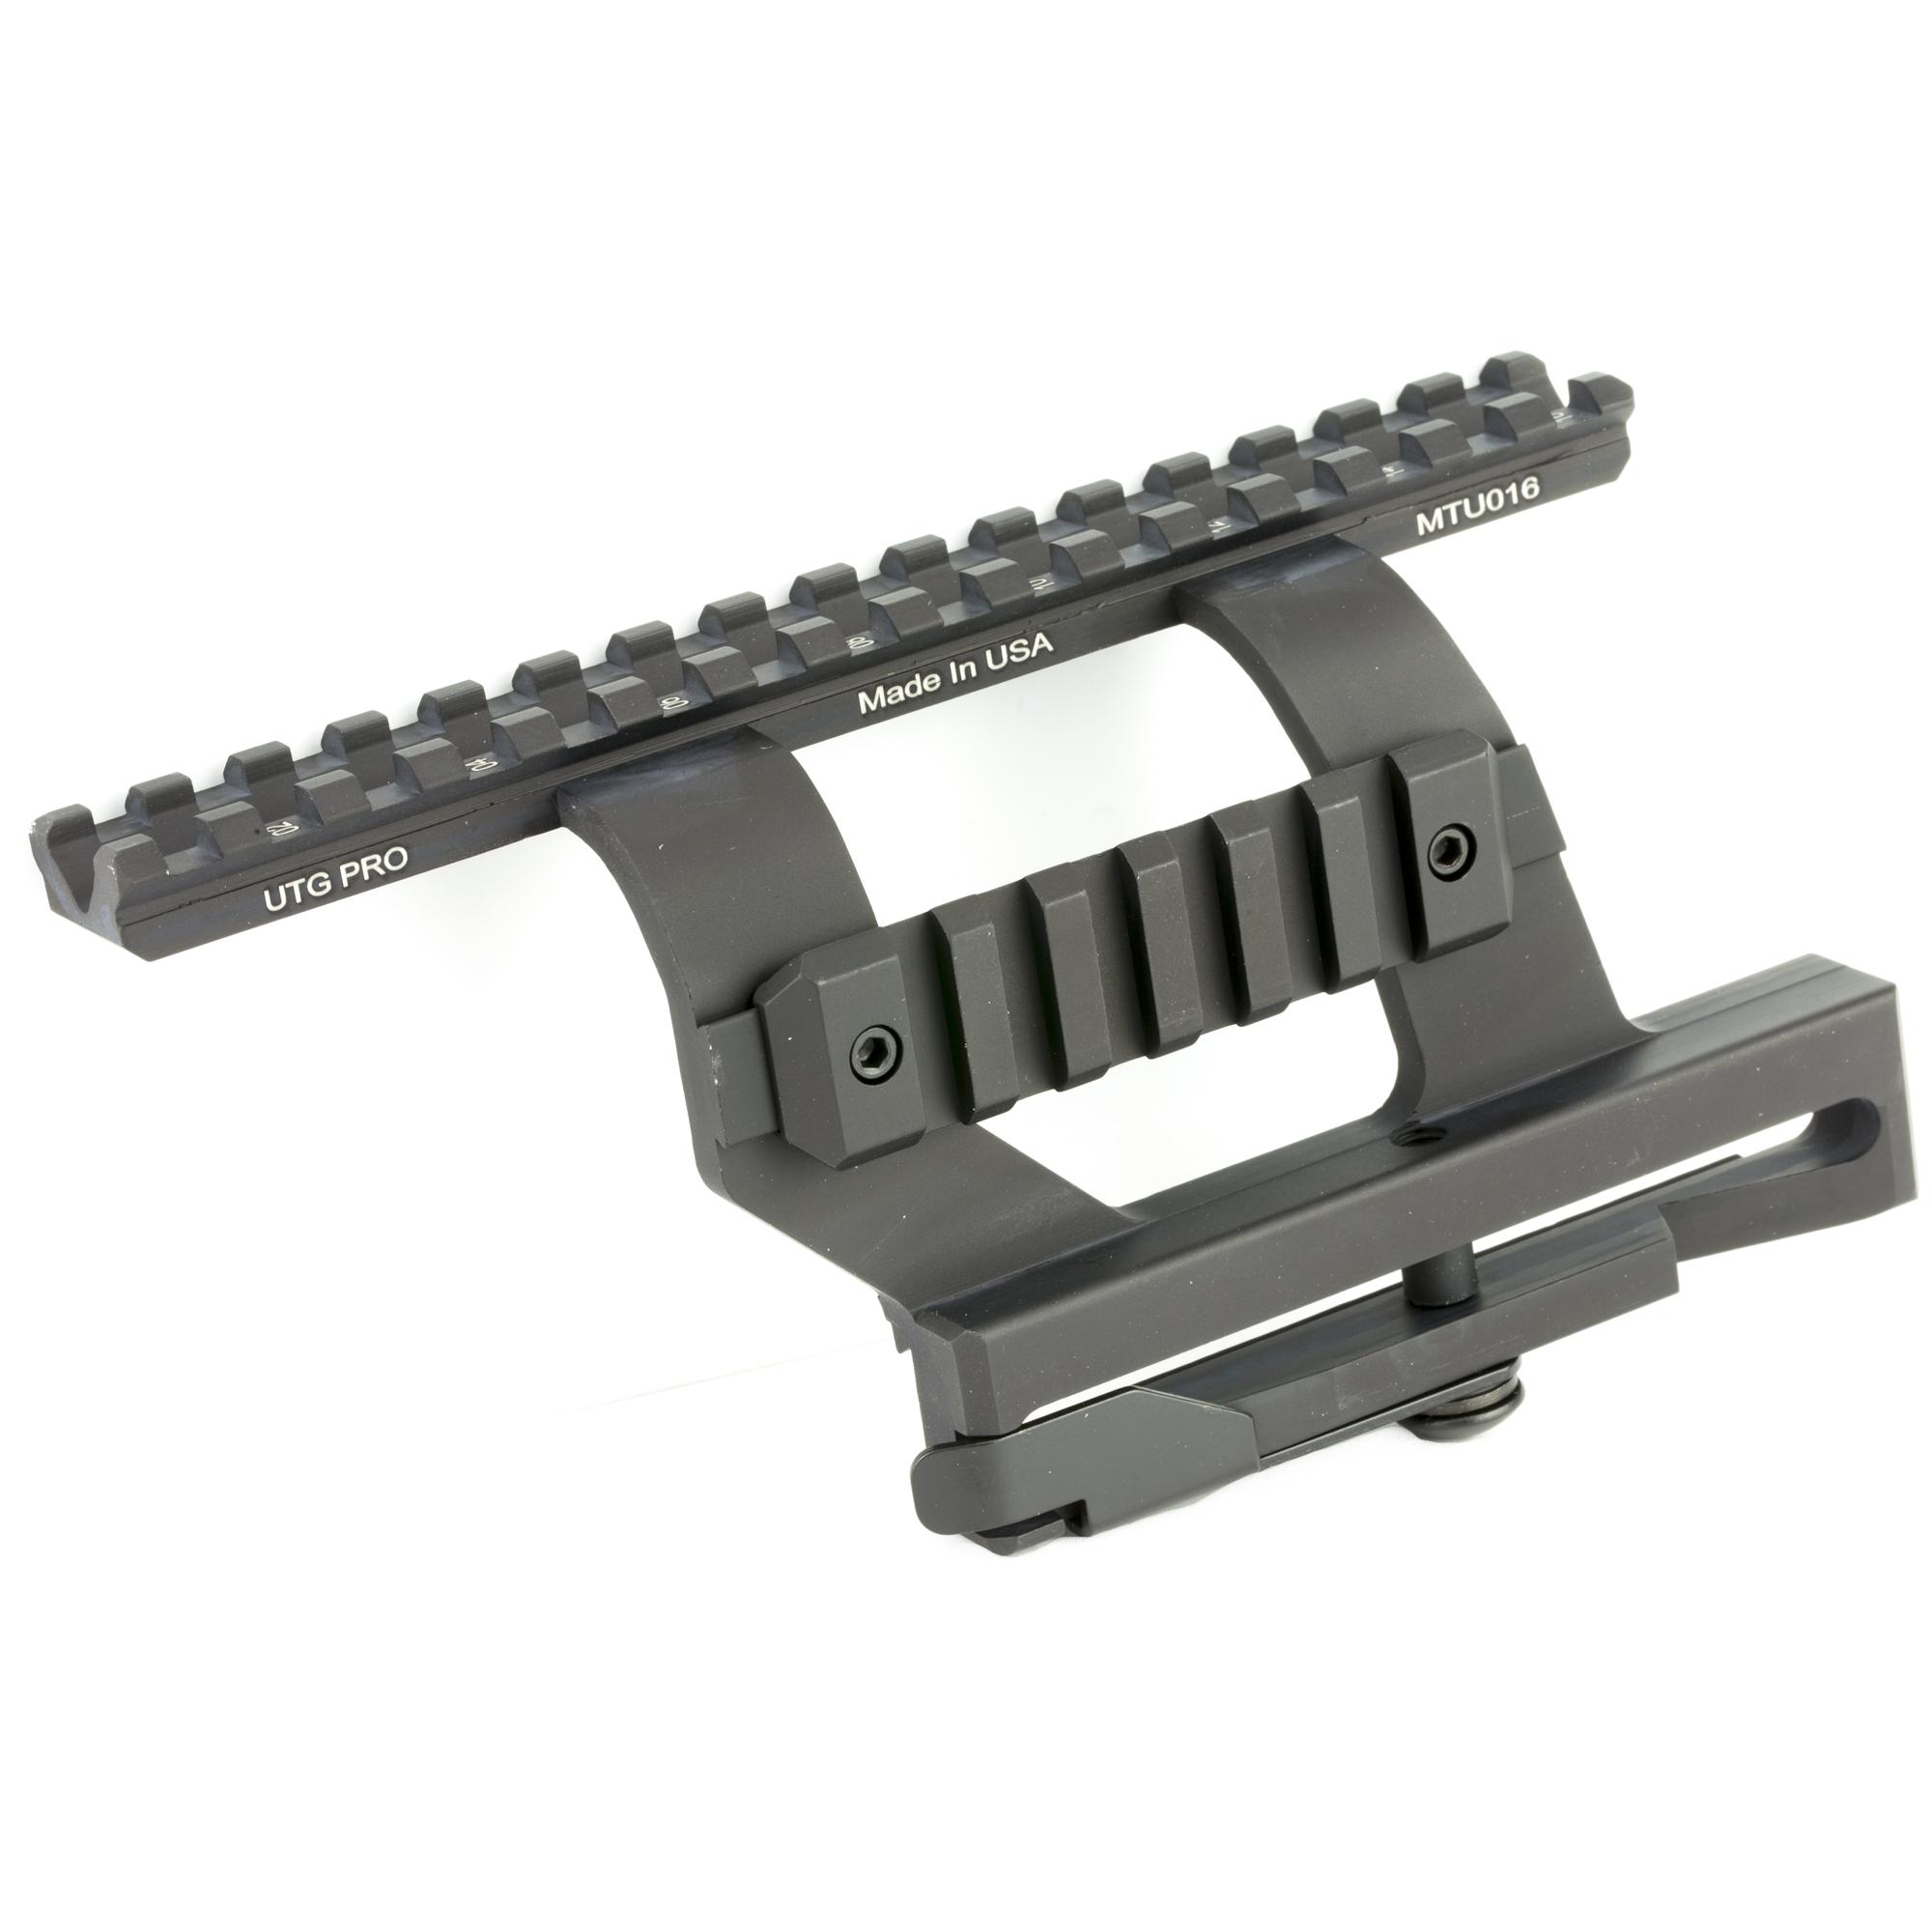 AK quick detach side mount scope rail made by UTG.